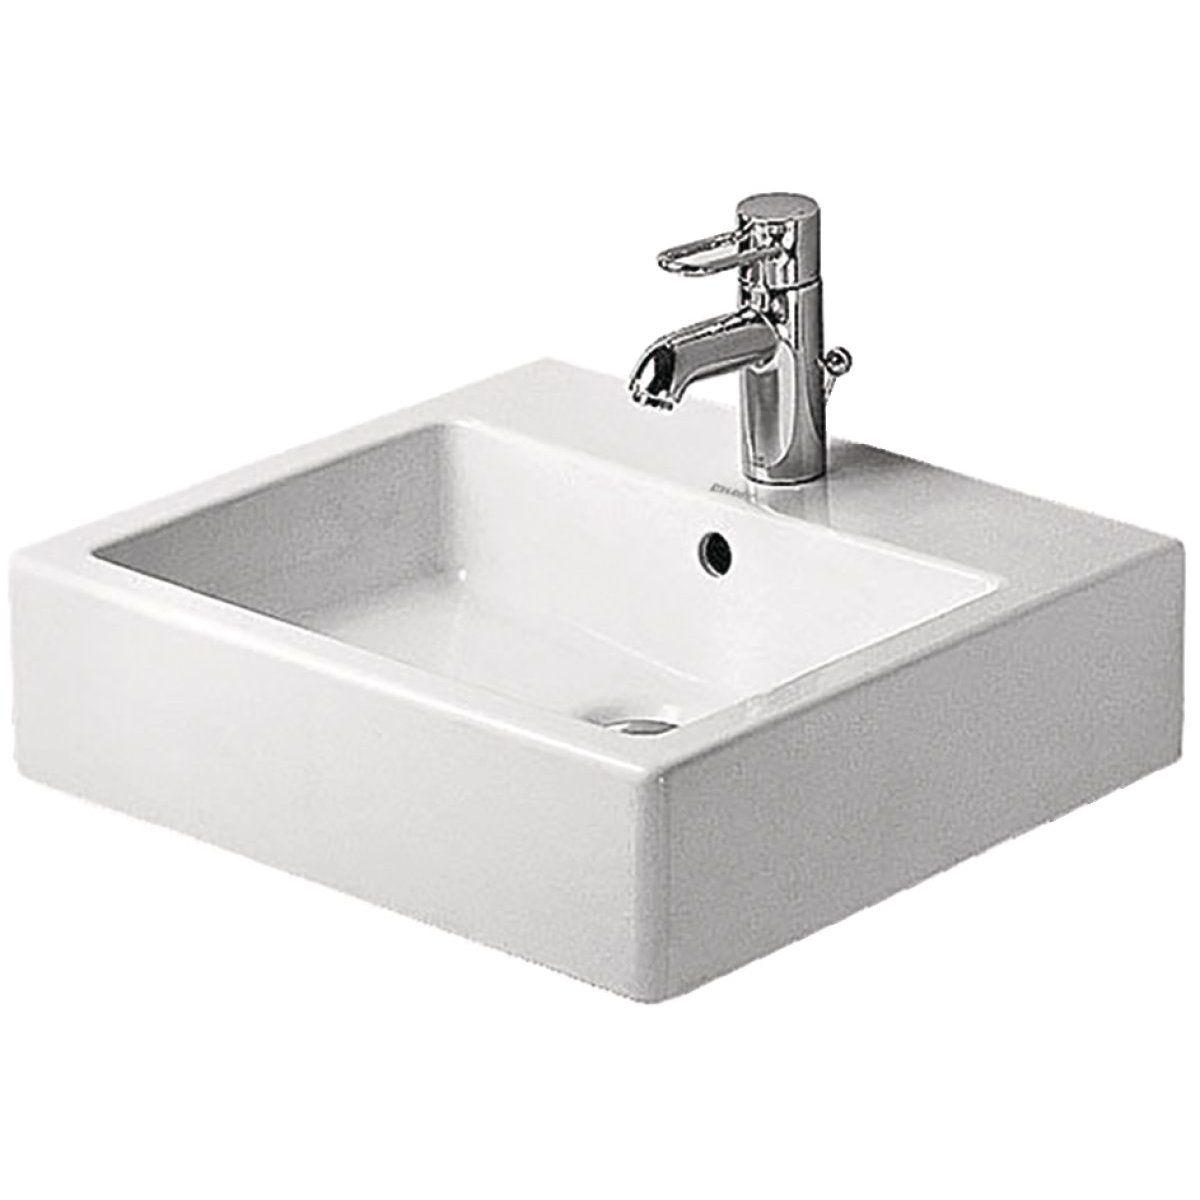 Lavabo 50 vero blanc 04545000001 - DURAVIT - null | Chalet Main ...